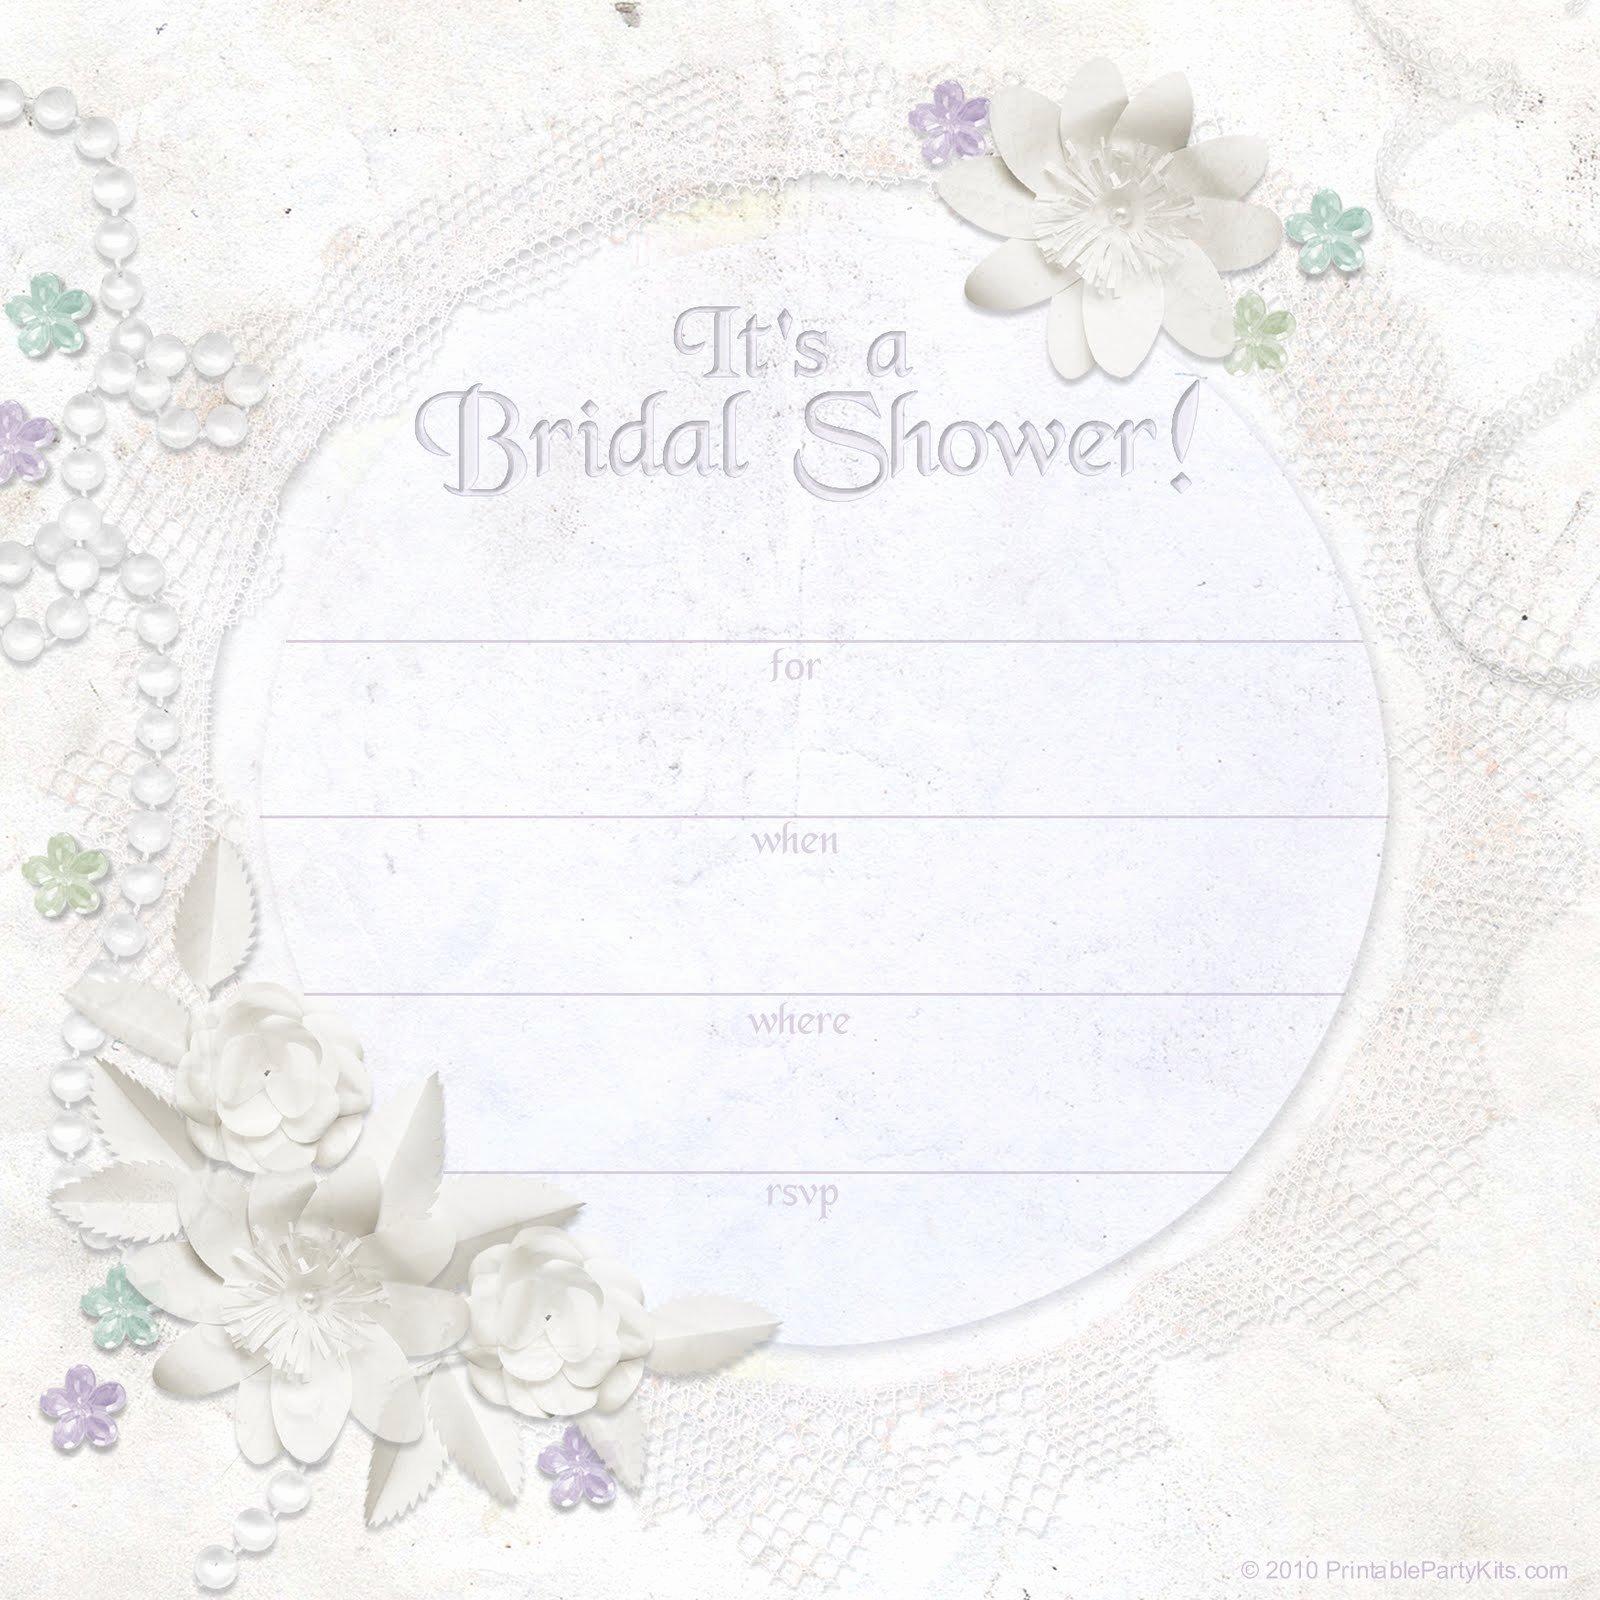 Bridal Shower Invitations Template Luxury Free Printable Bridal Shower Invitations